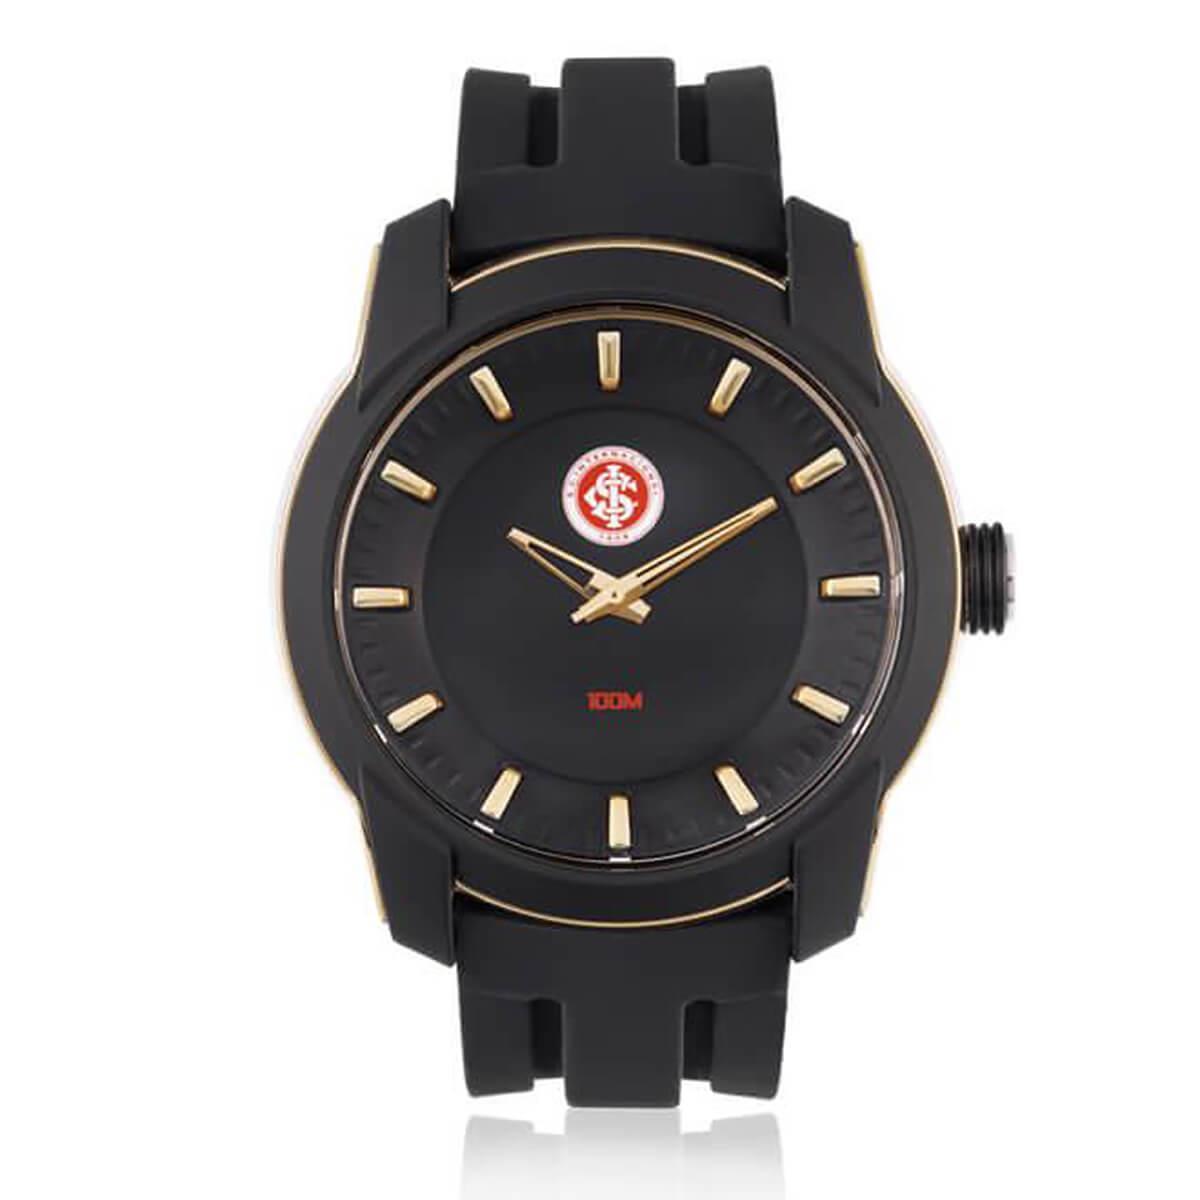 b6b4389fac7 Relógio Masculino Technos Internacional INT2035AB 8P Borracha